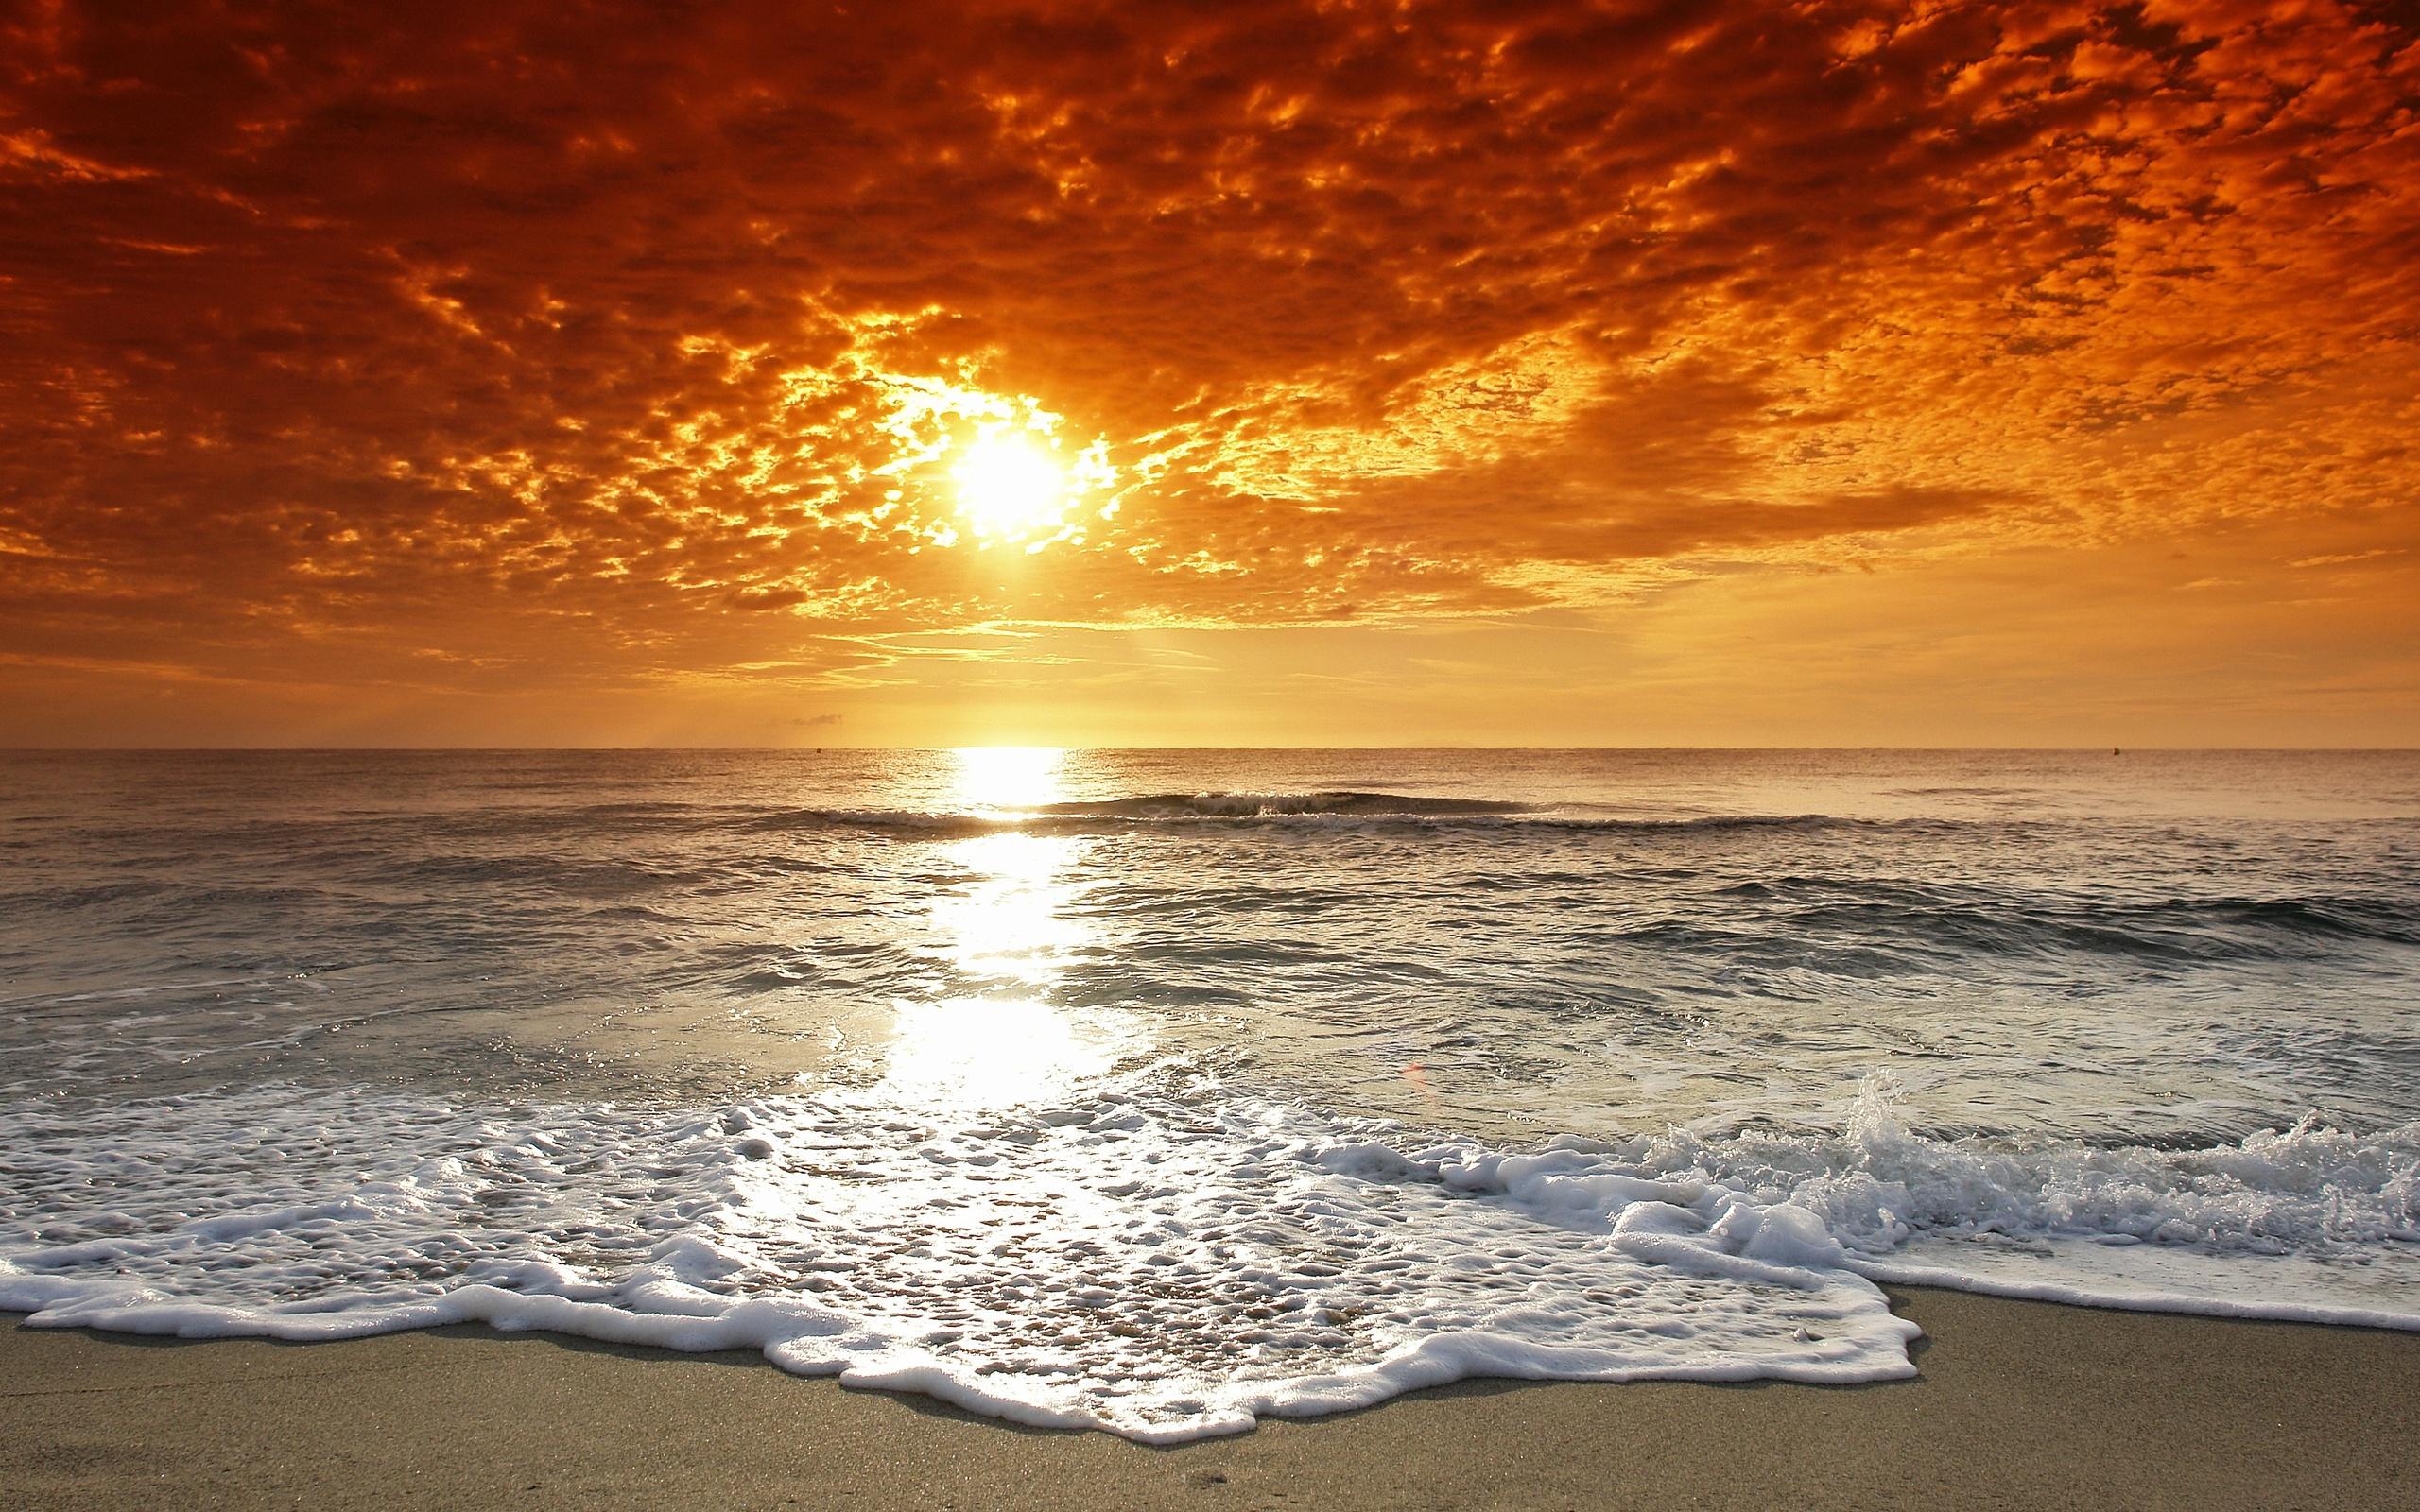 природа море горизонт небо облака пляж берег отдых nature sea horizon the sky clouds beach shore rest  № 821527 загрузить